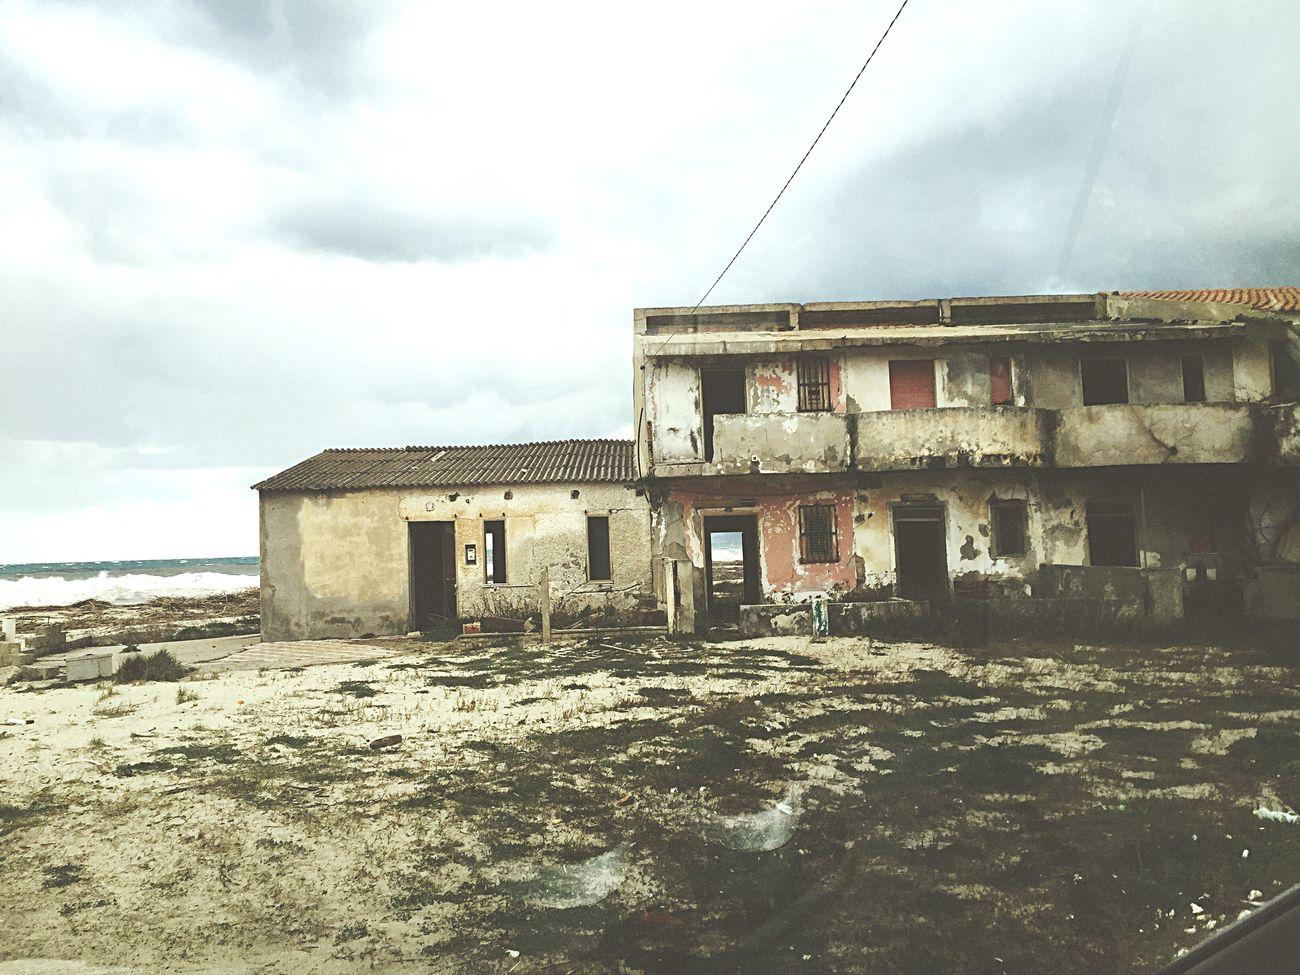 Horror Calabriadascoprire 😍😌😊